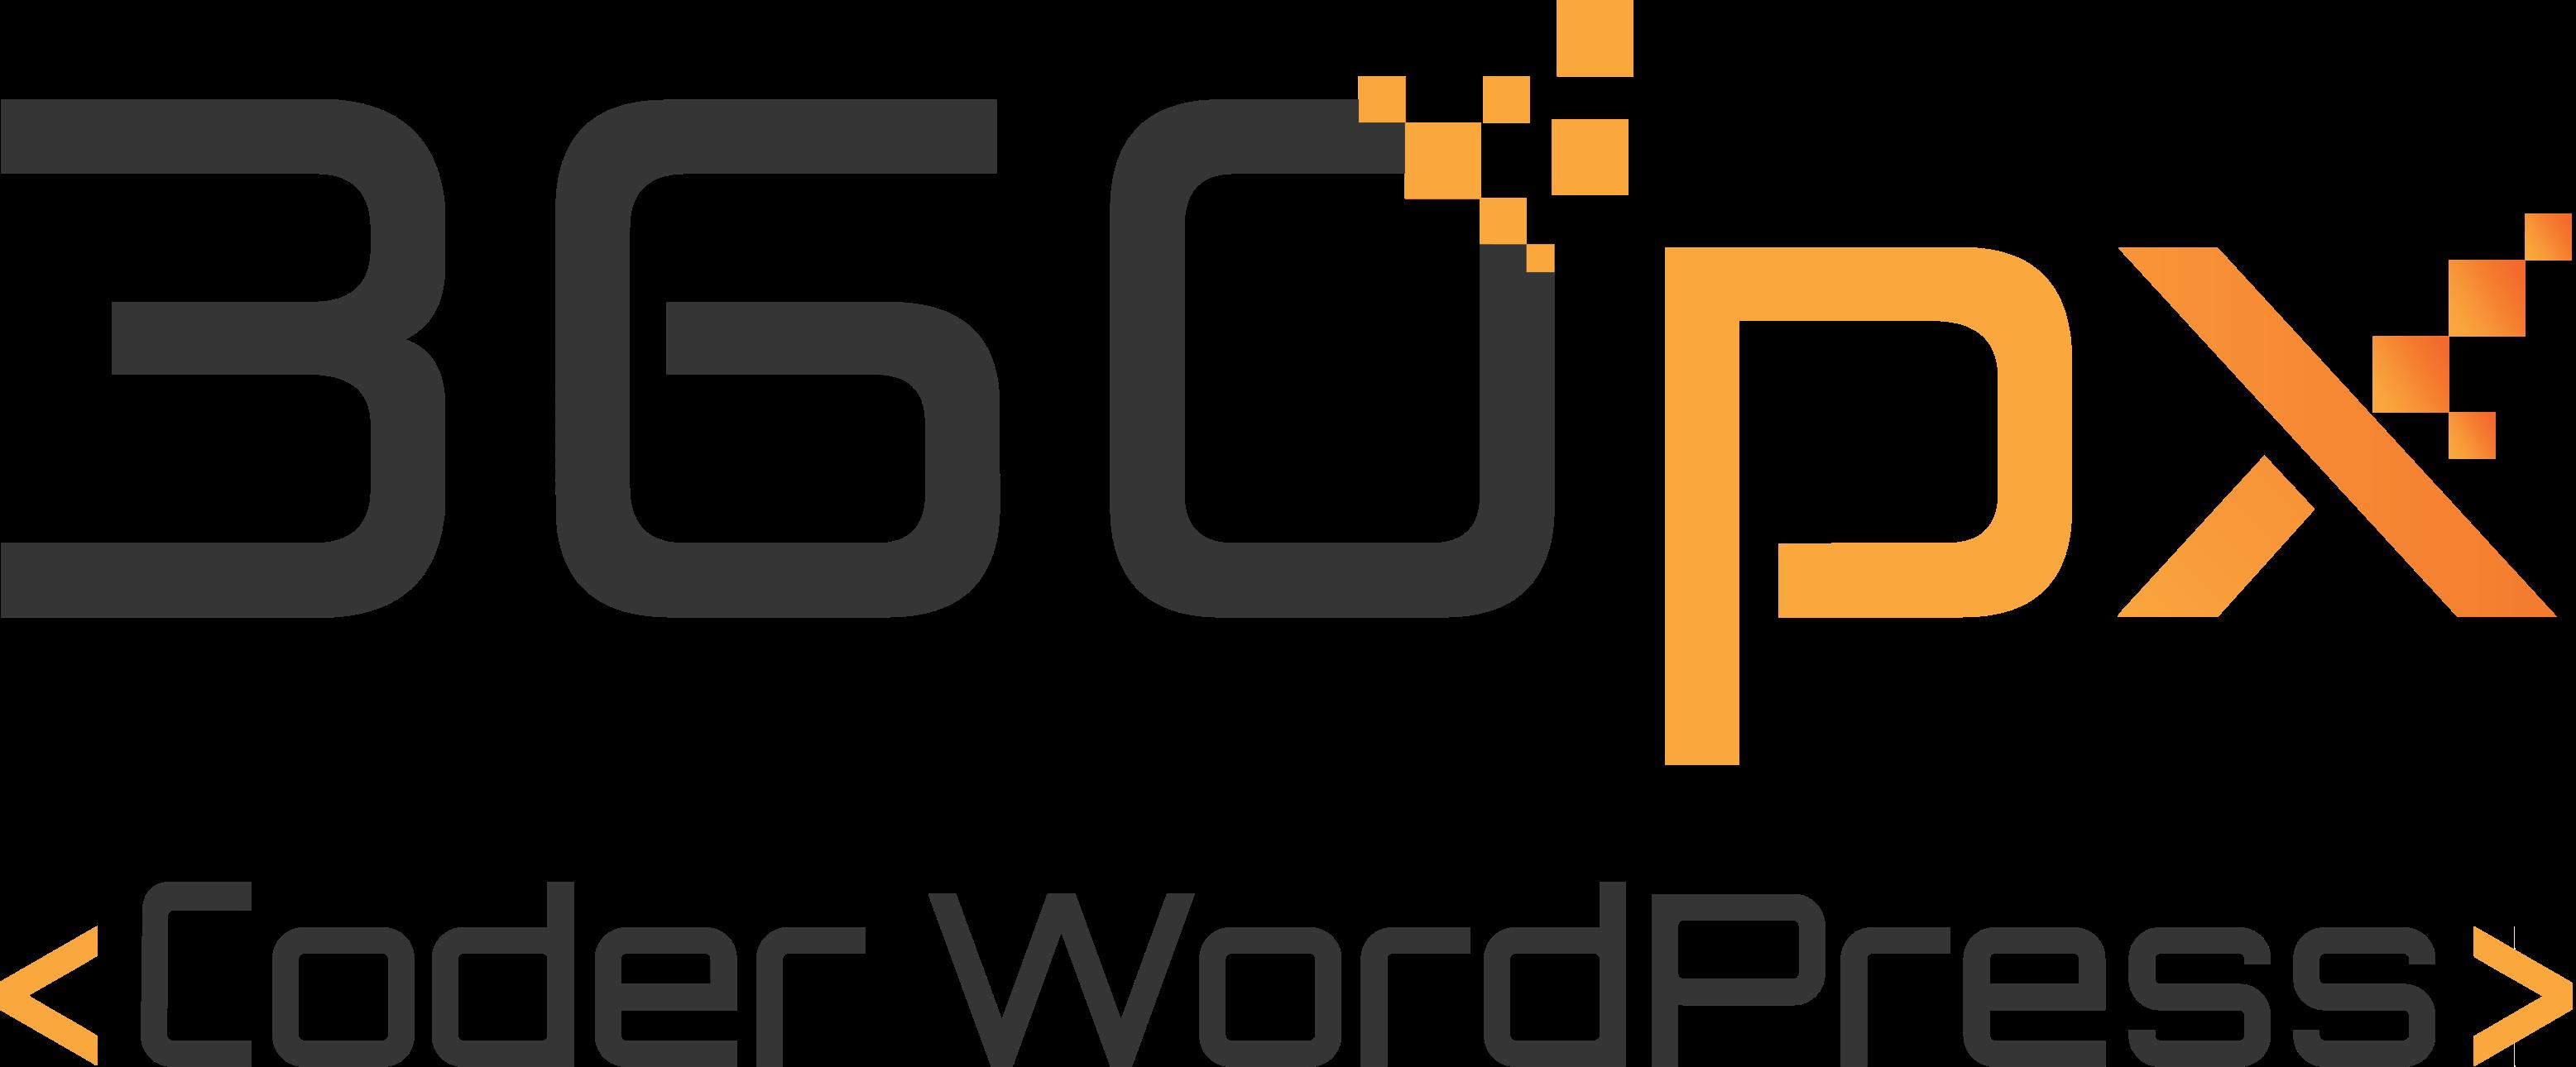 360px Logo